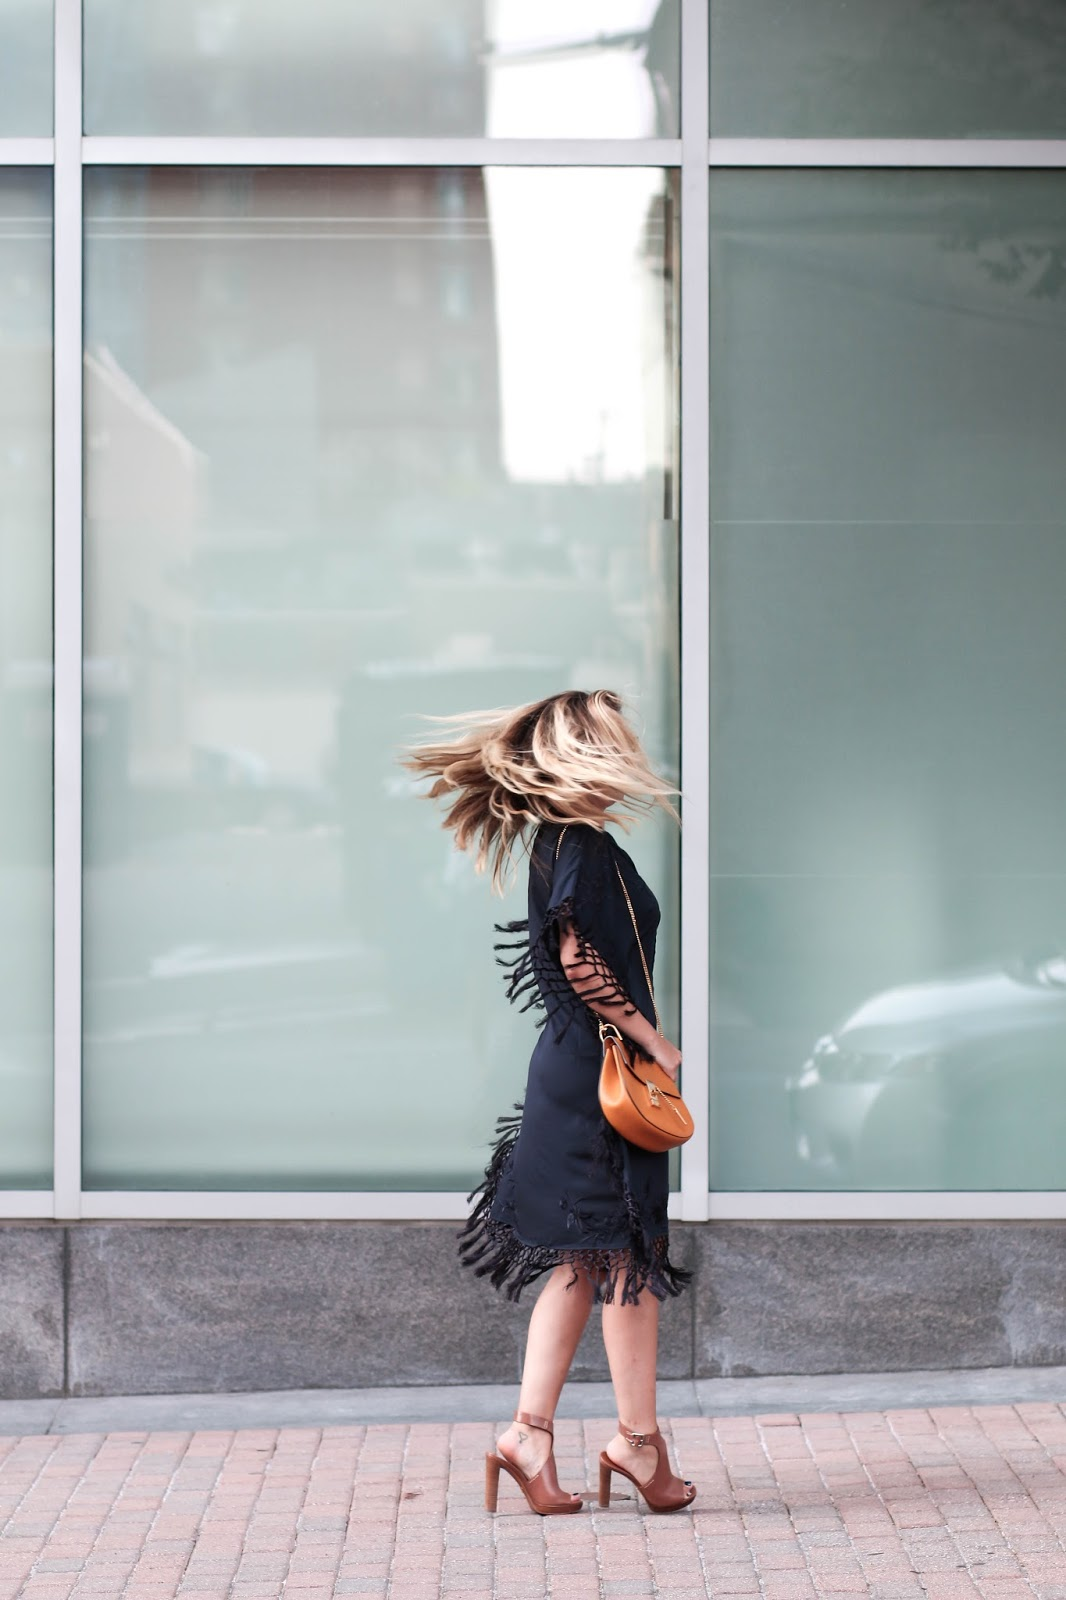 fringe, french connection, dress, black, summer, outfit, style, prada, heels, rayban, sunglasses, chloe, bag, borrow, style, blog, dc, fashion